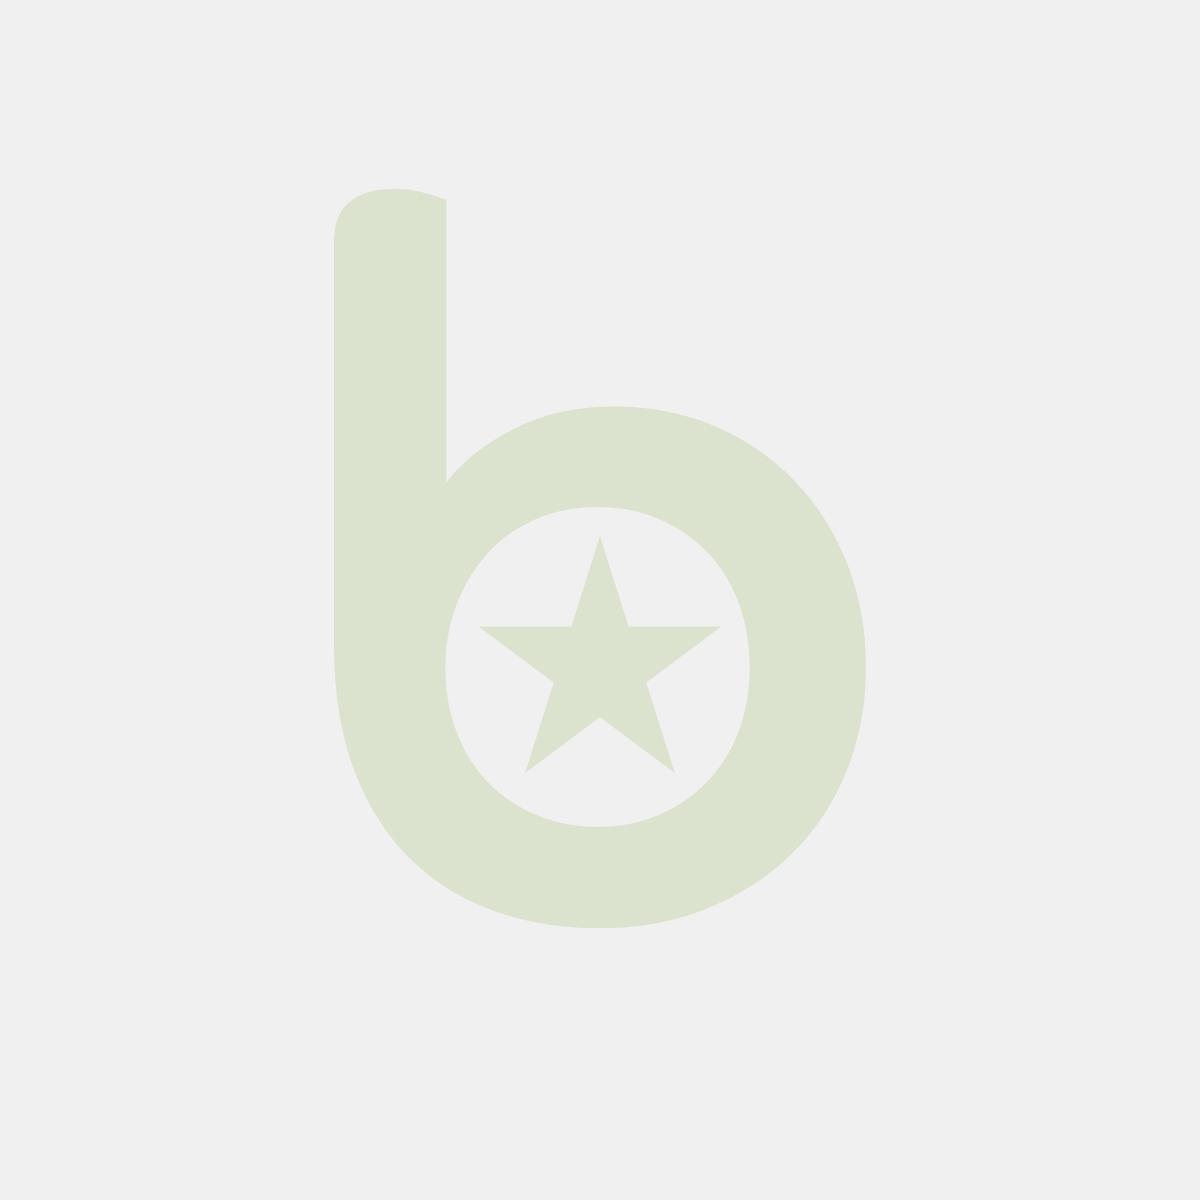 Pojemnik Gn 1/3 - 325X176 Mm 65